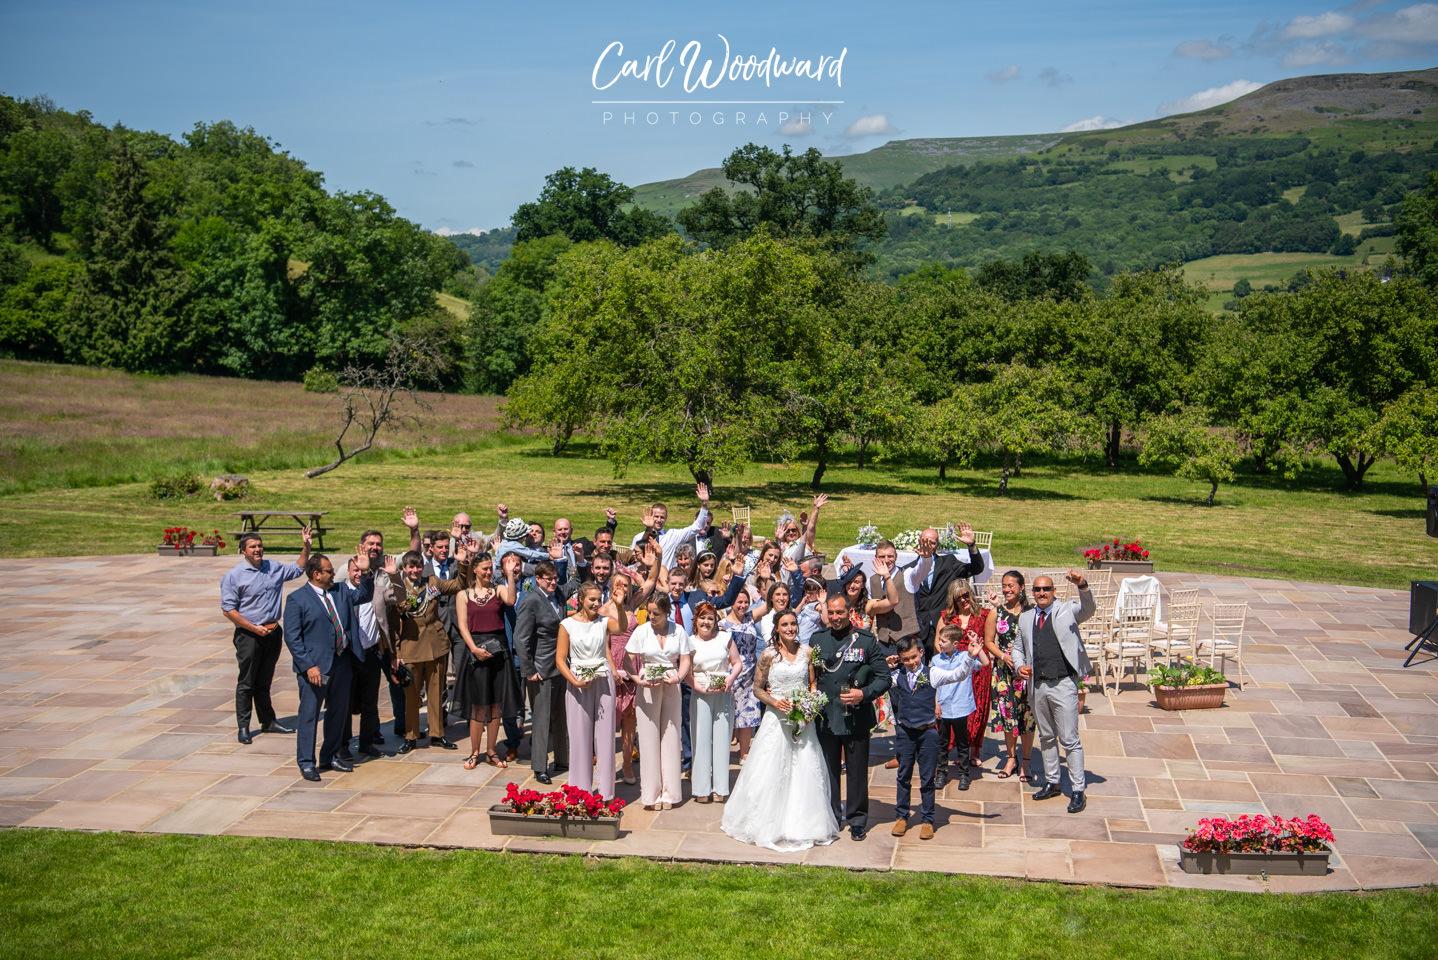 010-The-Old-Rectory-Hotel-Wedding-Photography-Cardiff-Wedding-Photographer.jpg